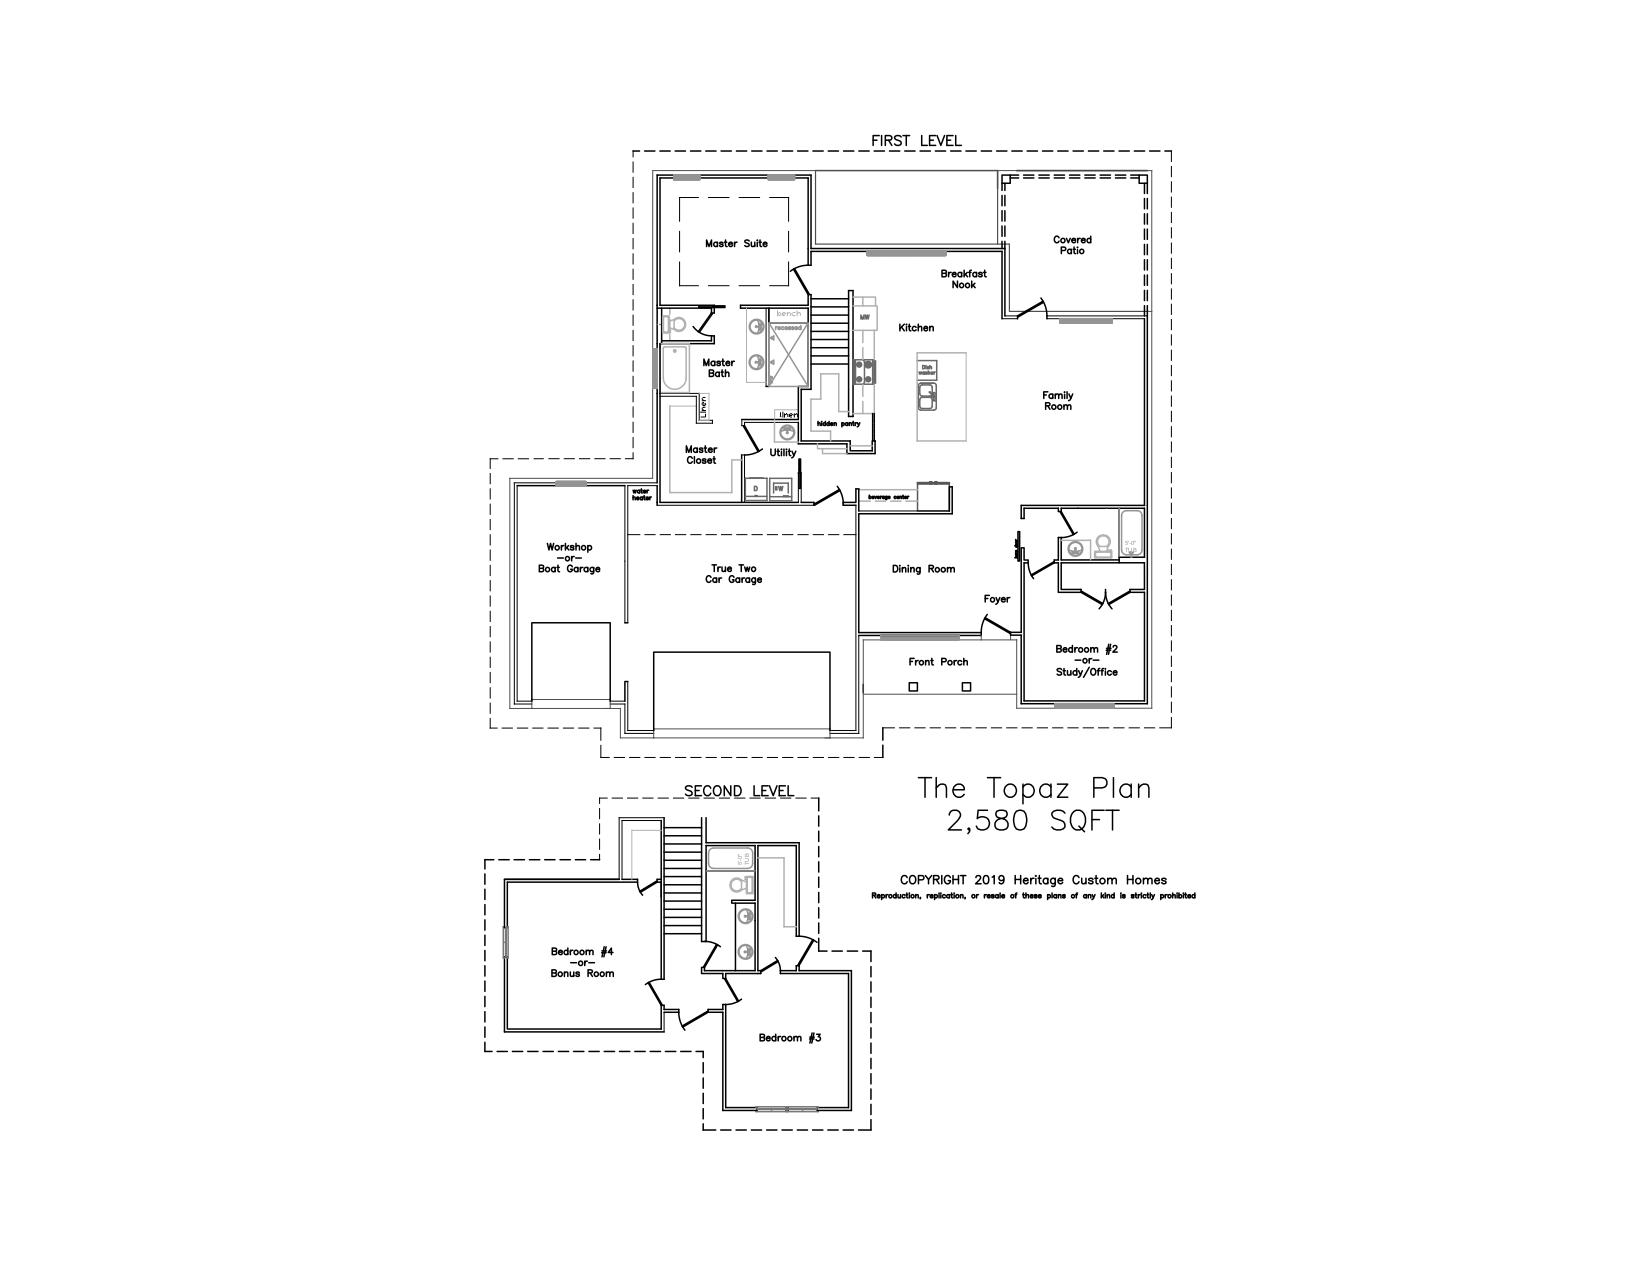 The Topaz Floorplan